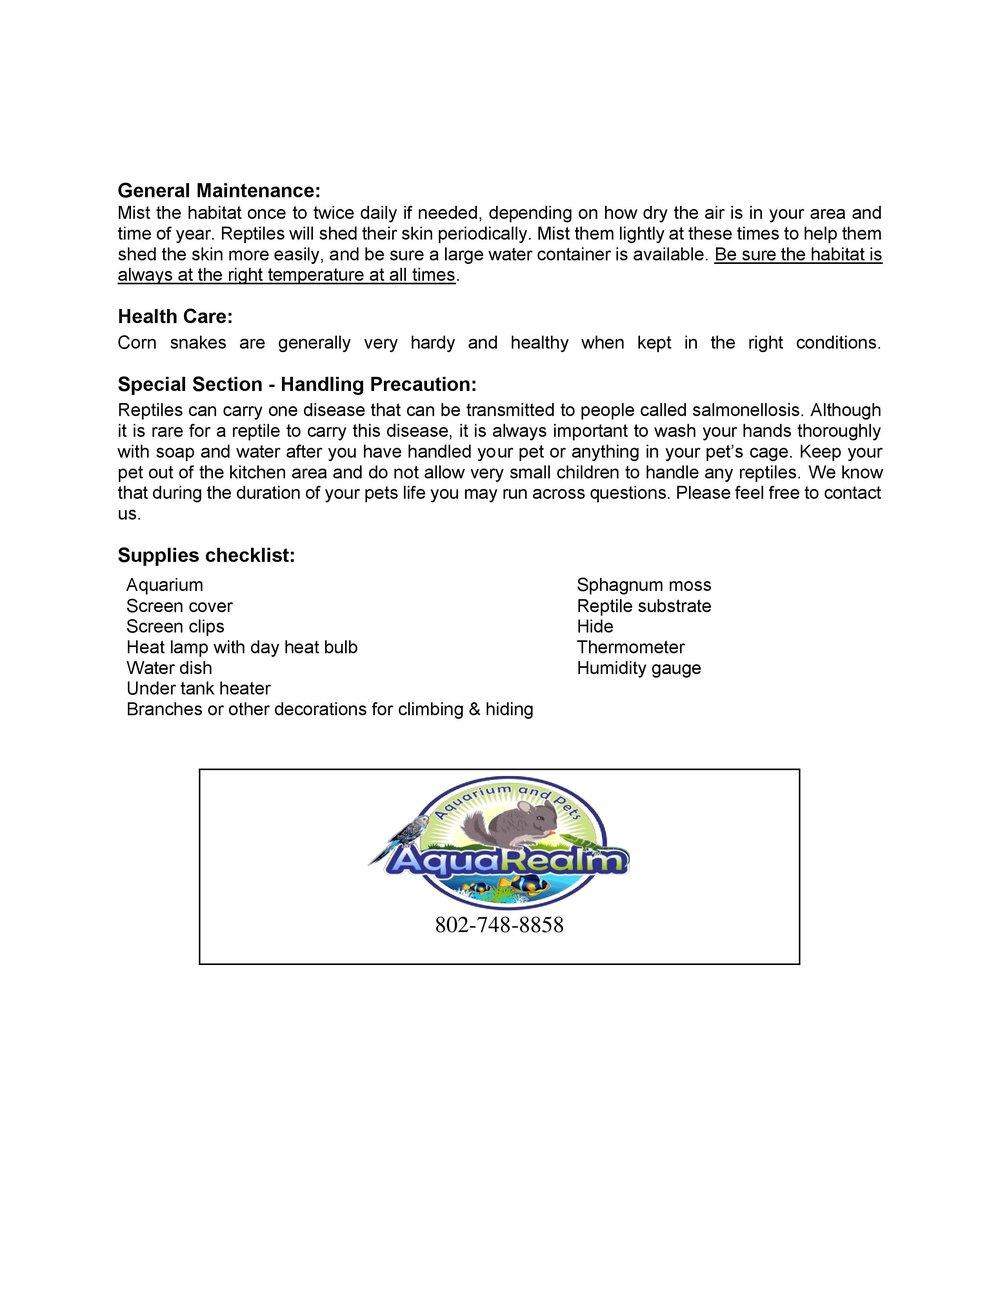 Corn Snake Car Sheet pg2